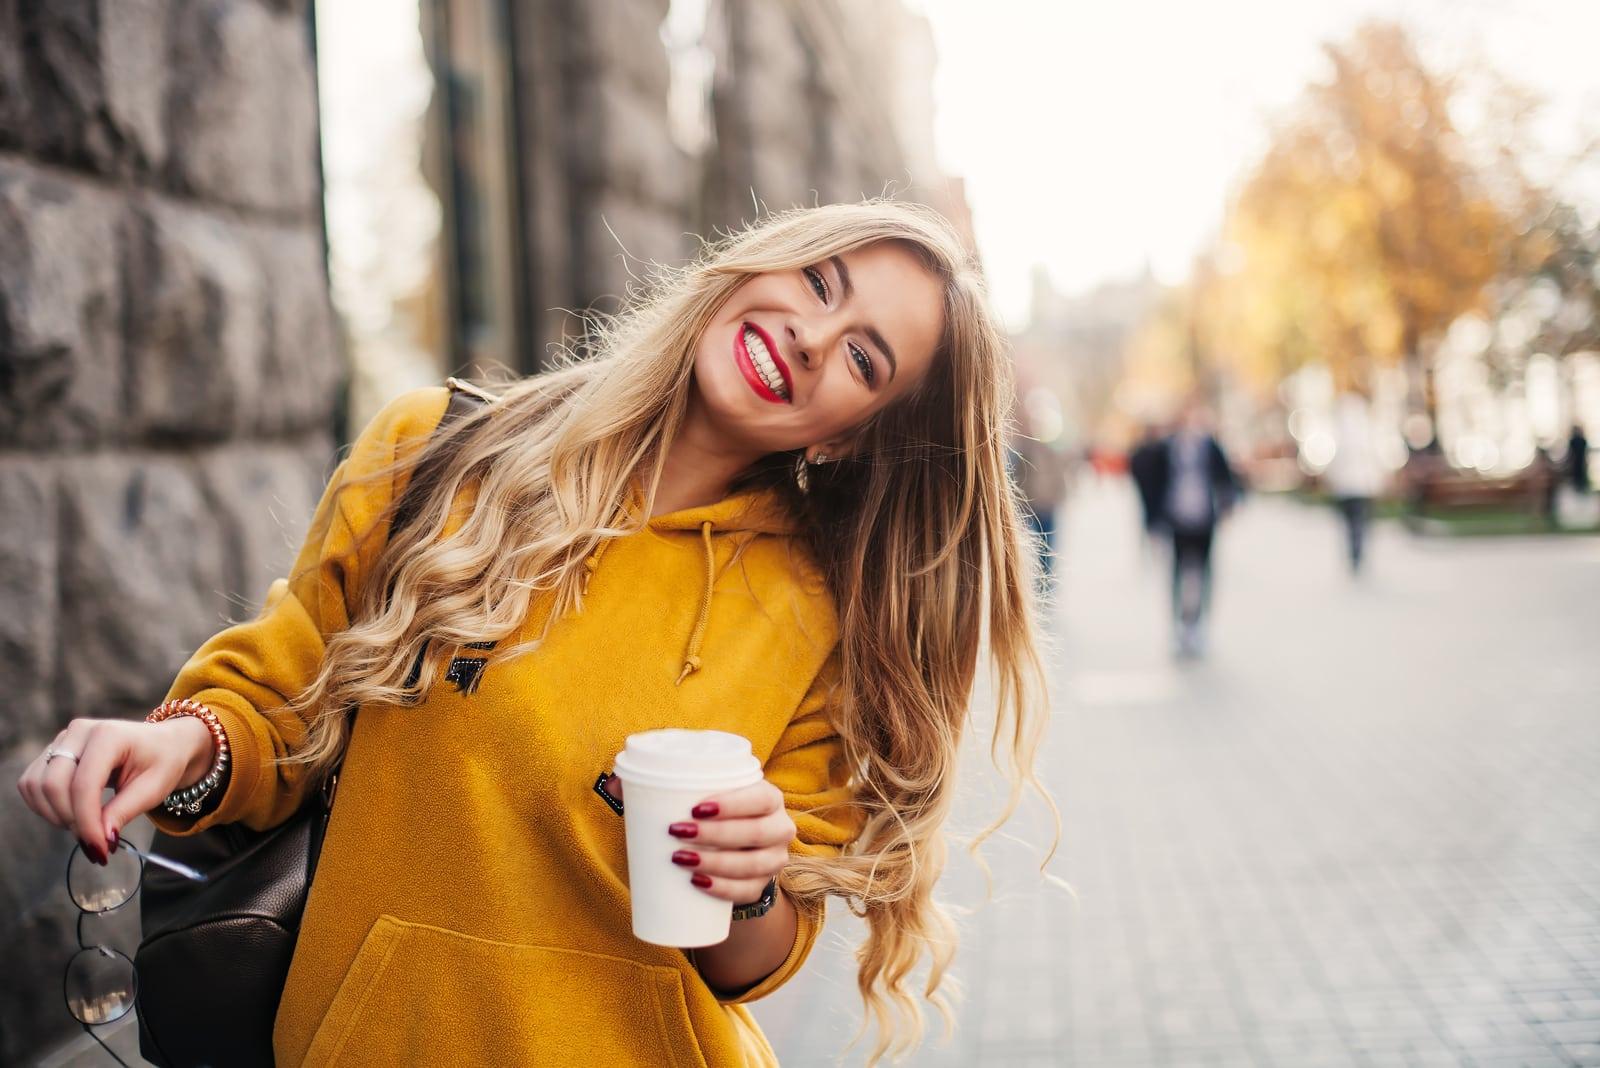 a beautiful smiling blonde in a yellow sweatshirt walks down the street